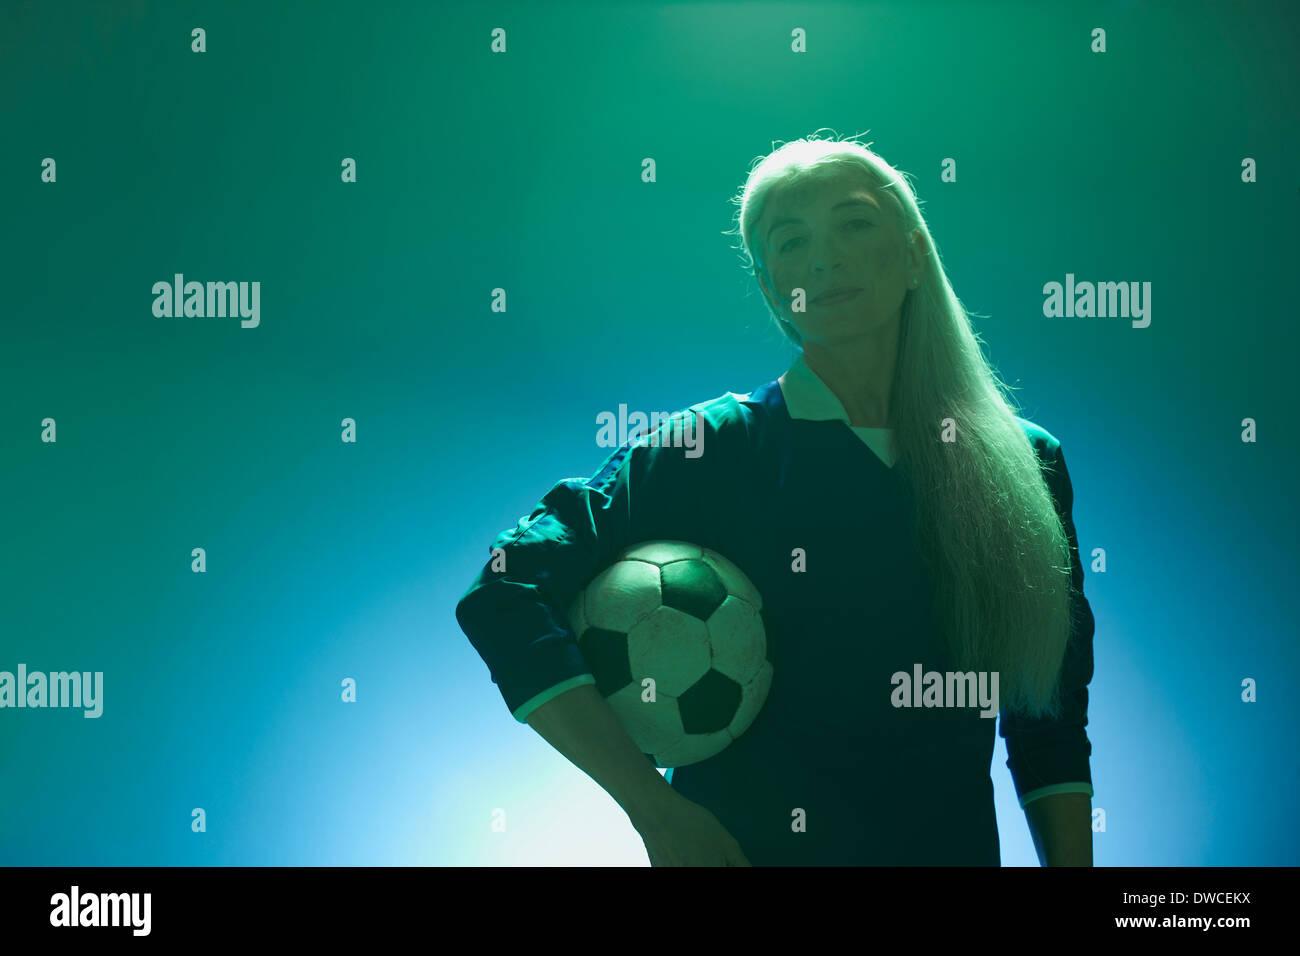 Mature woman holding football, backlit - Stock Image